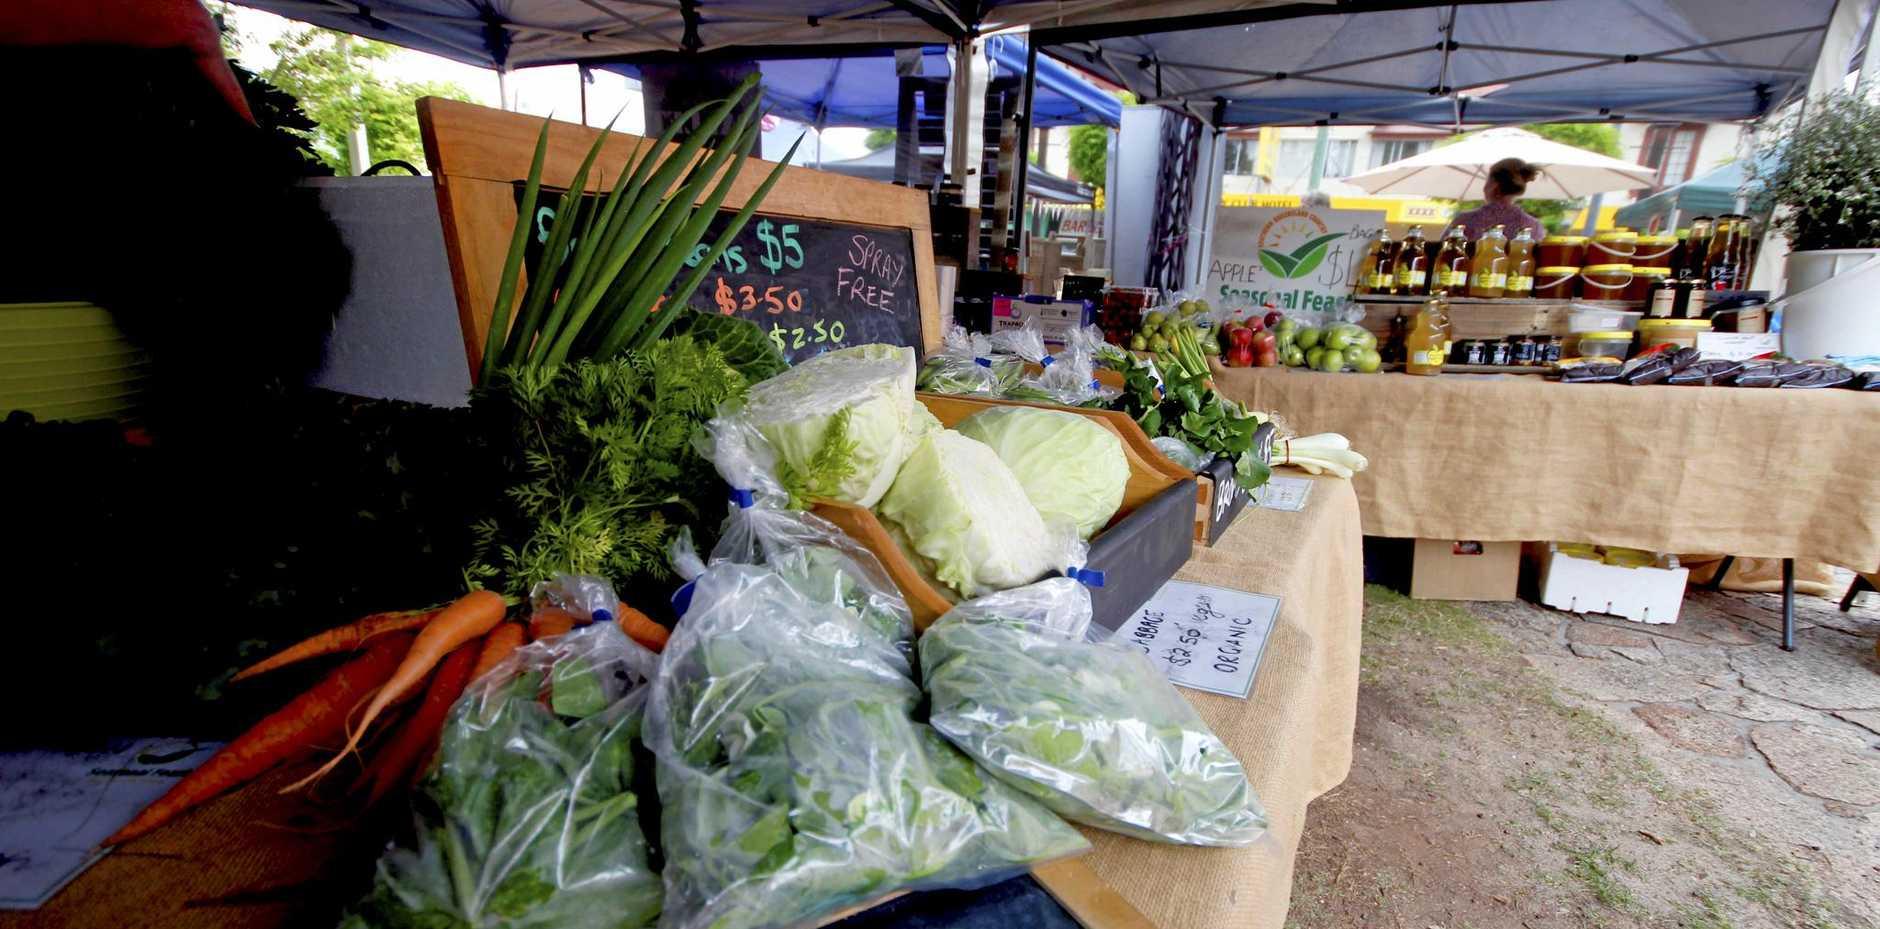 Fresh produce at the Seasonal Feast markets.